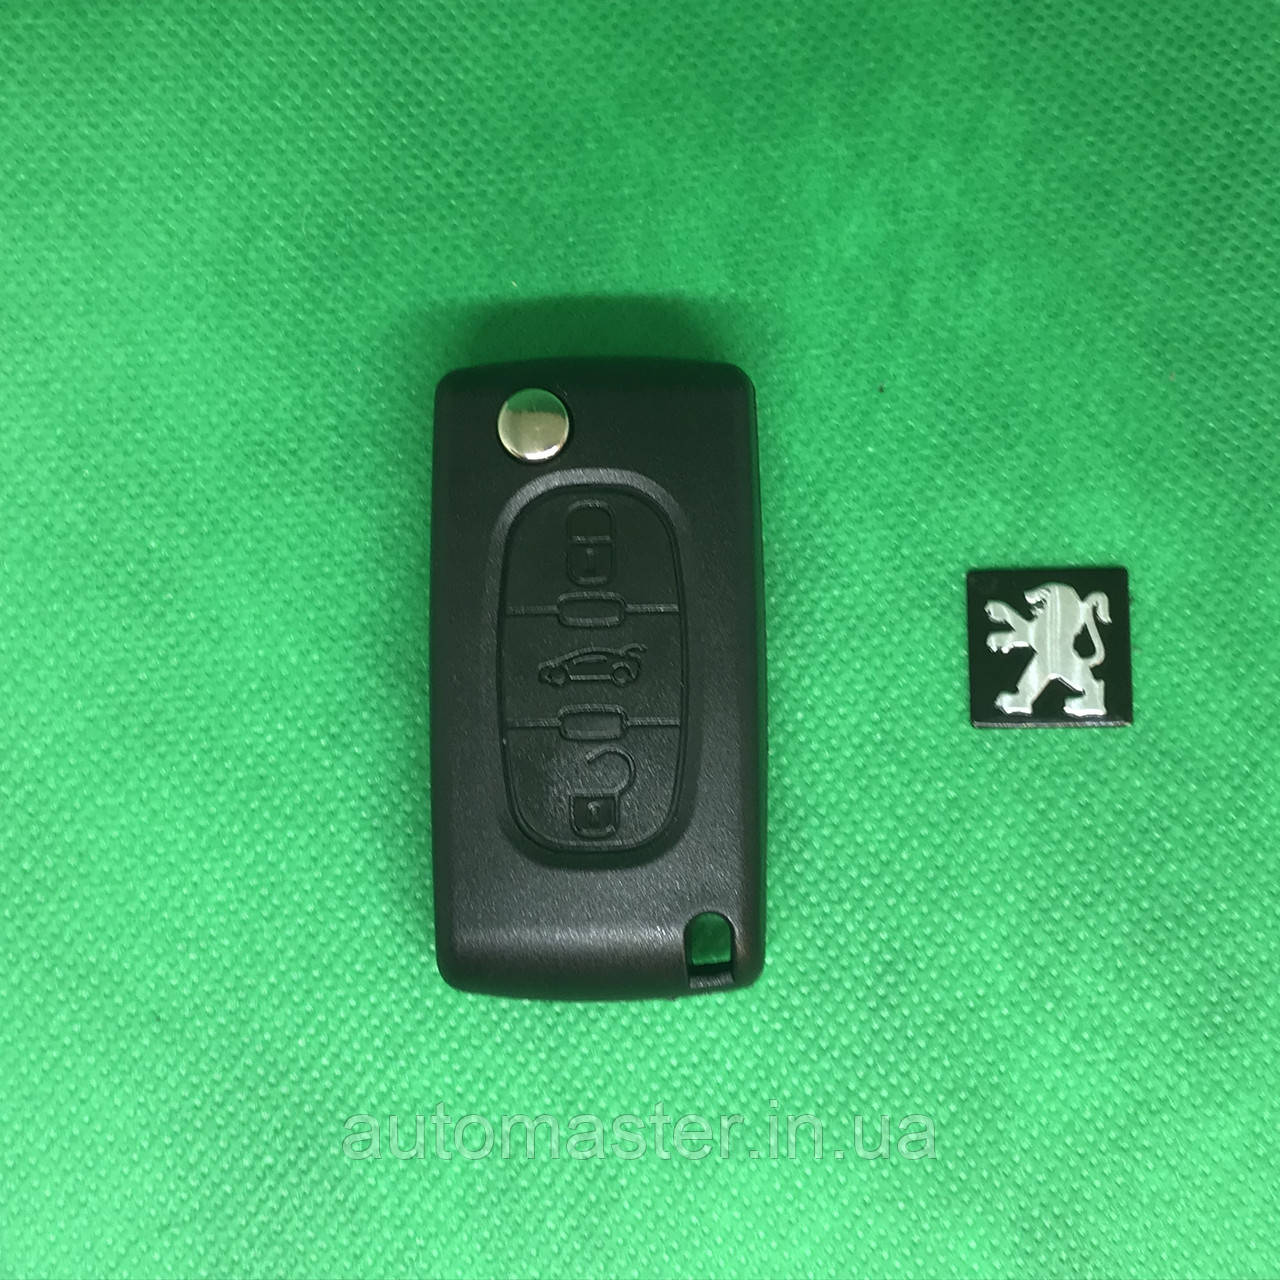 Ключ для PEUGEOT (Пежо) 407, 4007, 607  3 - кнопки с чипом ID46(7961)/433 Mhz